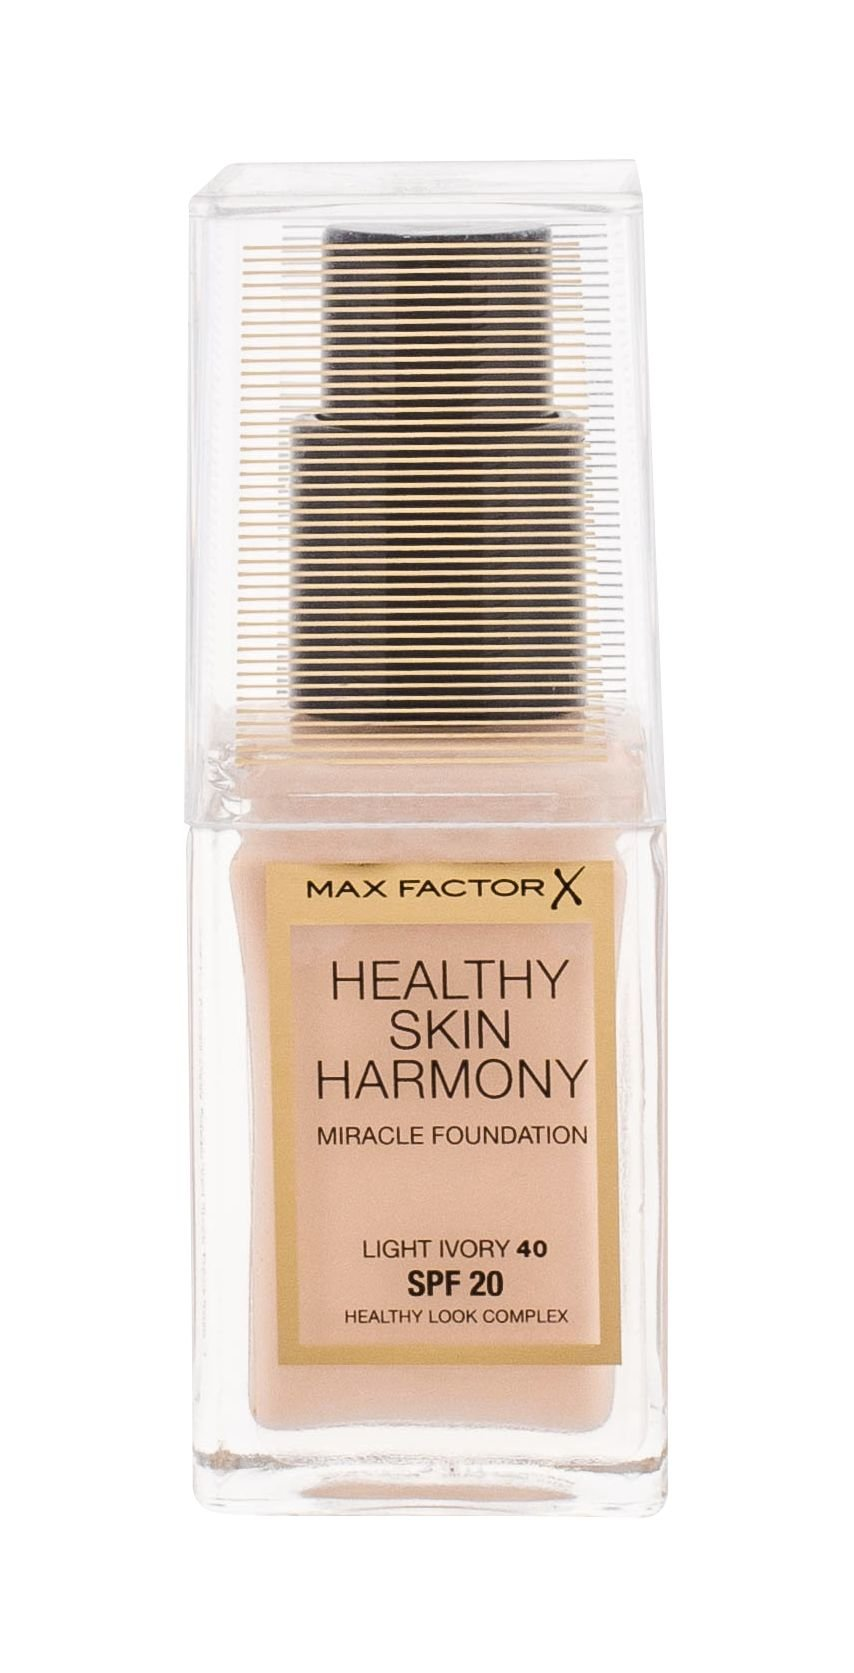 Max Factor Healthy Skin Harmony Makeup 30ml 40 Light Ivory